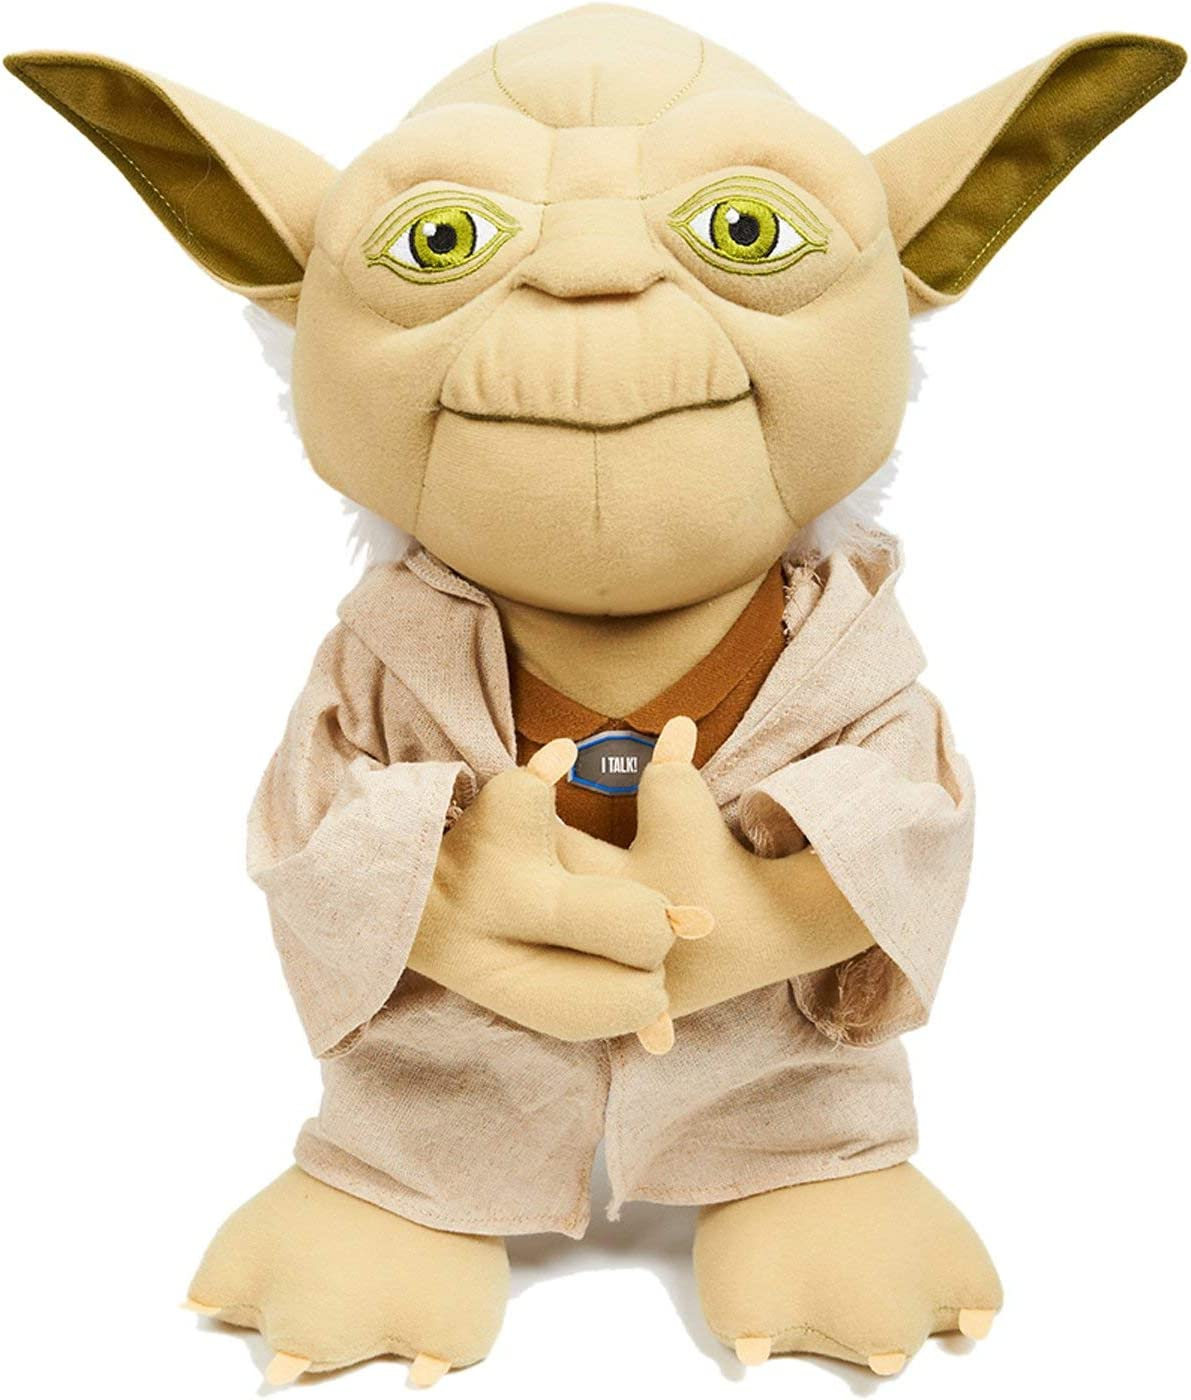 Amazon.com: Juguetes subterráneos, figura de Yoda de Star ...